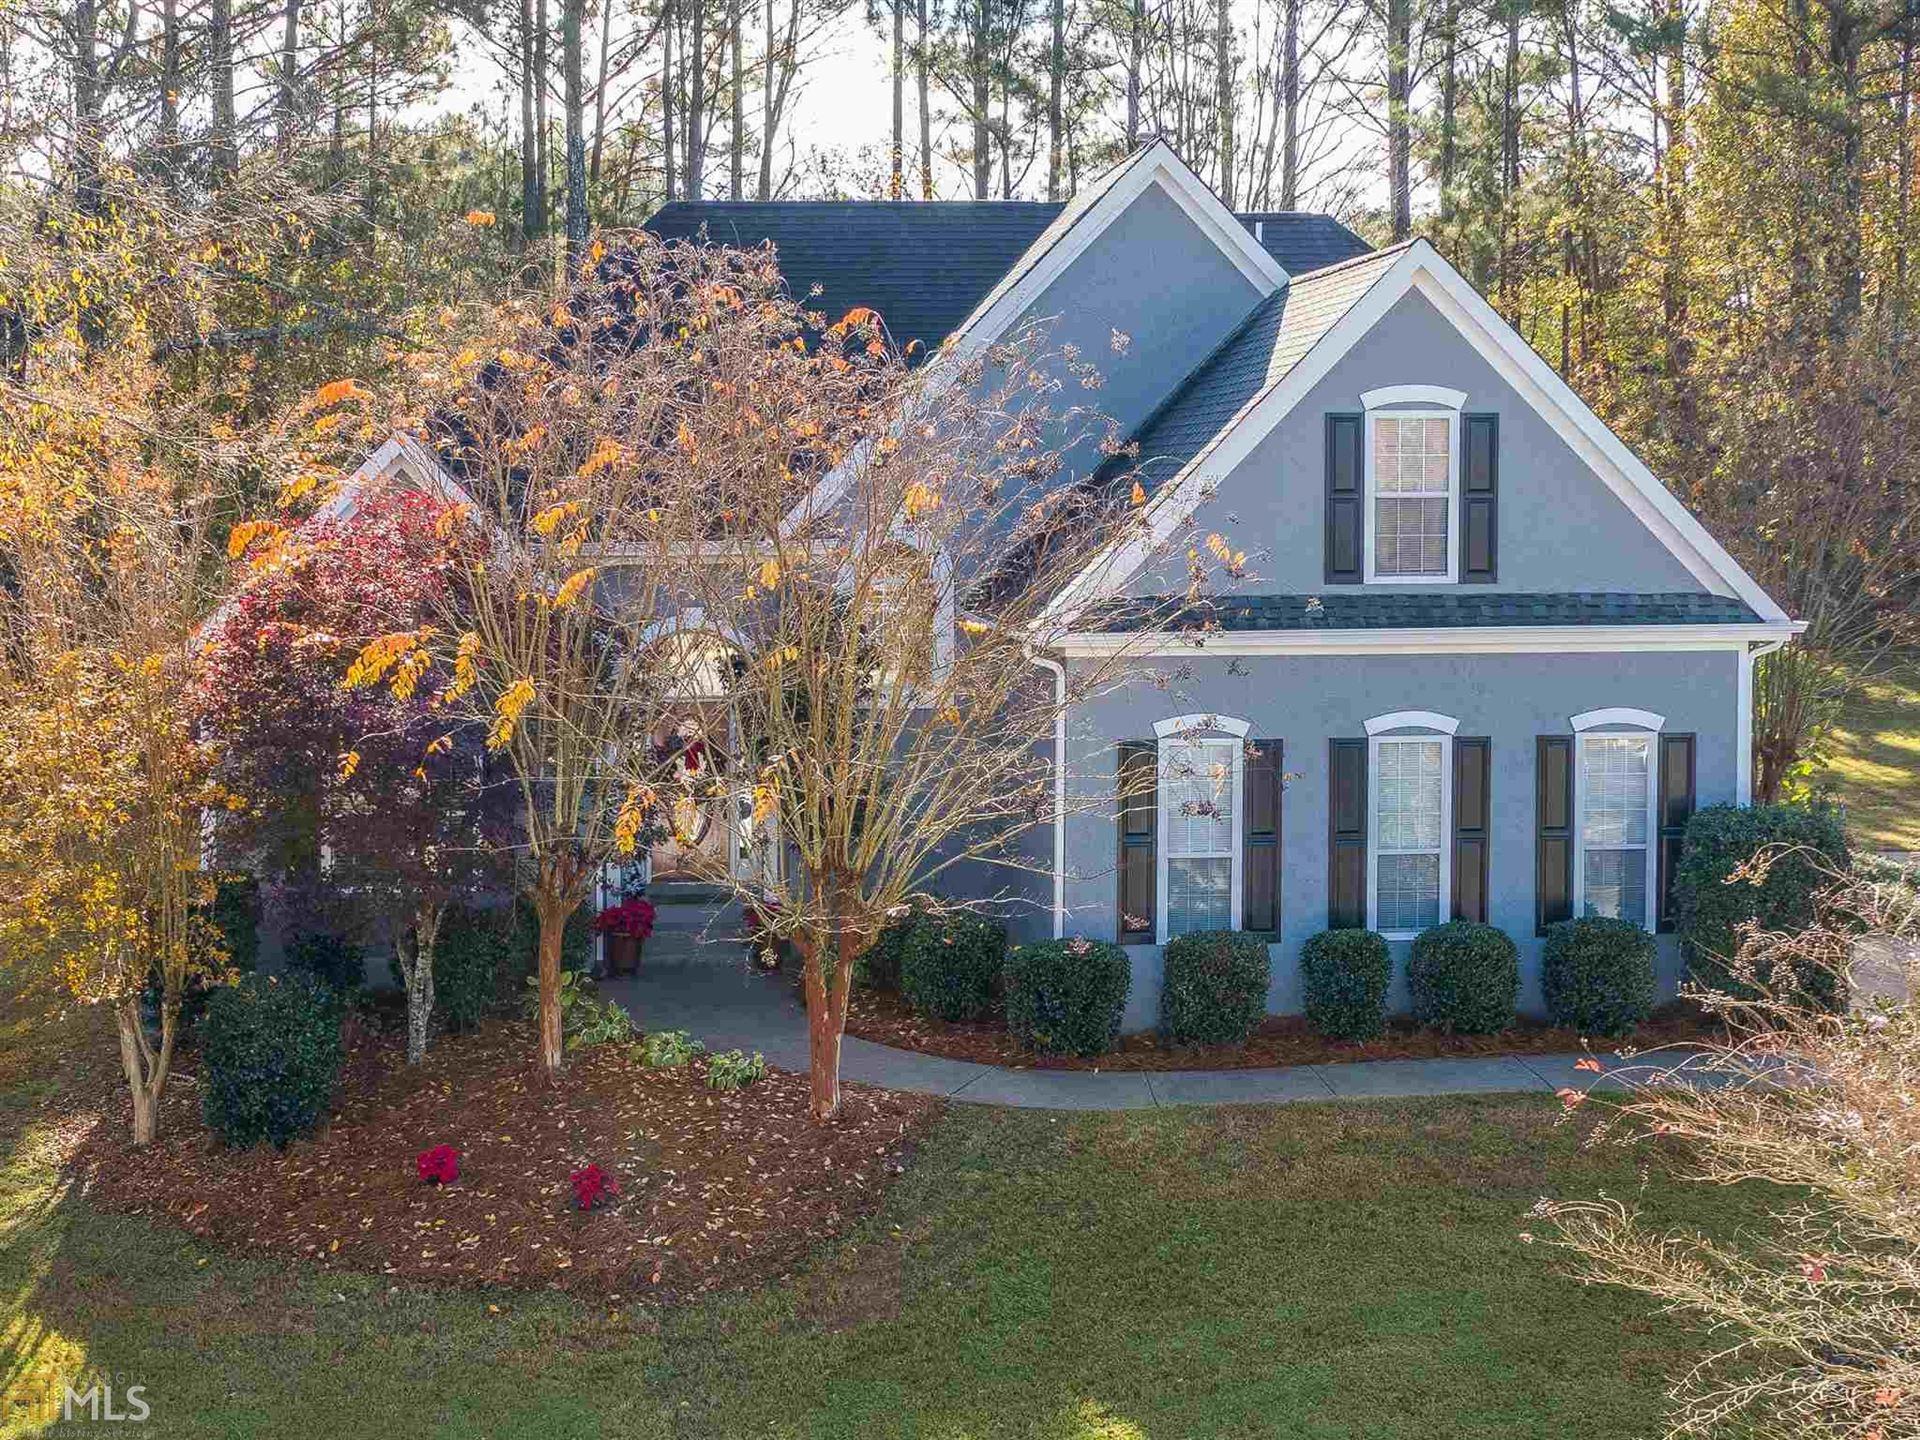 558 Oak Trl, Hampton, GA 30228 - MLS#: 8894723